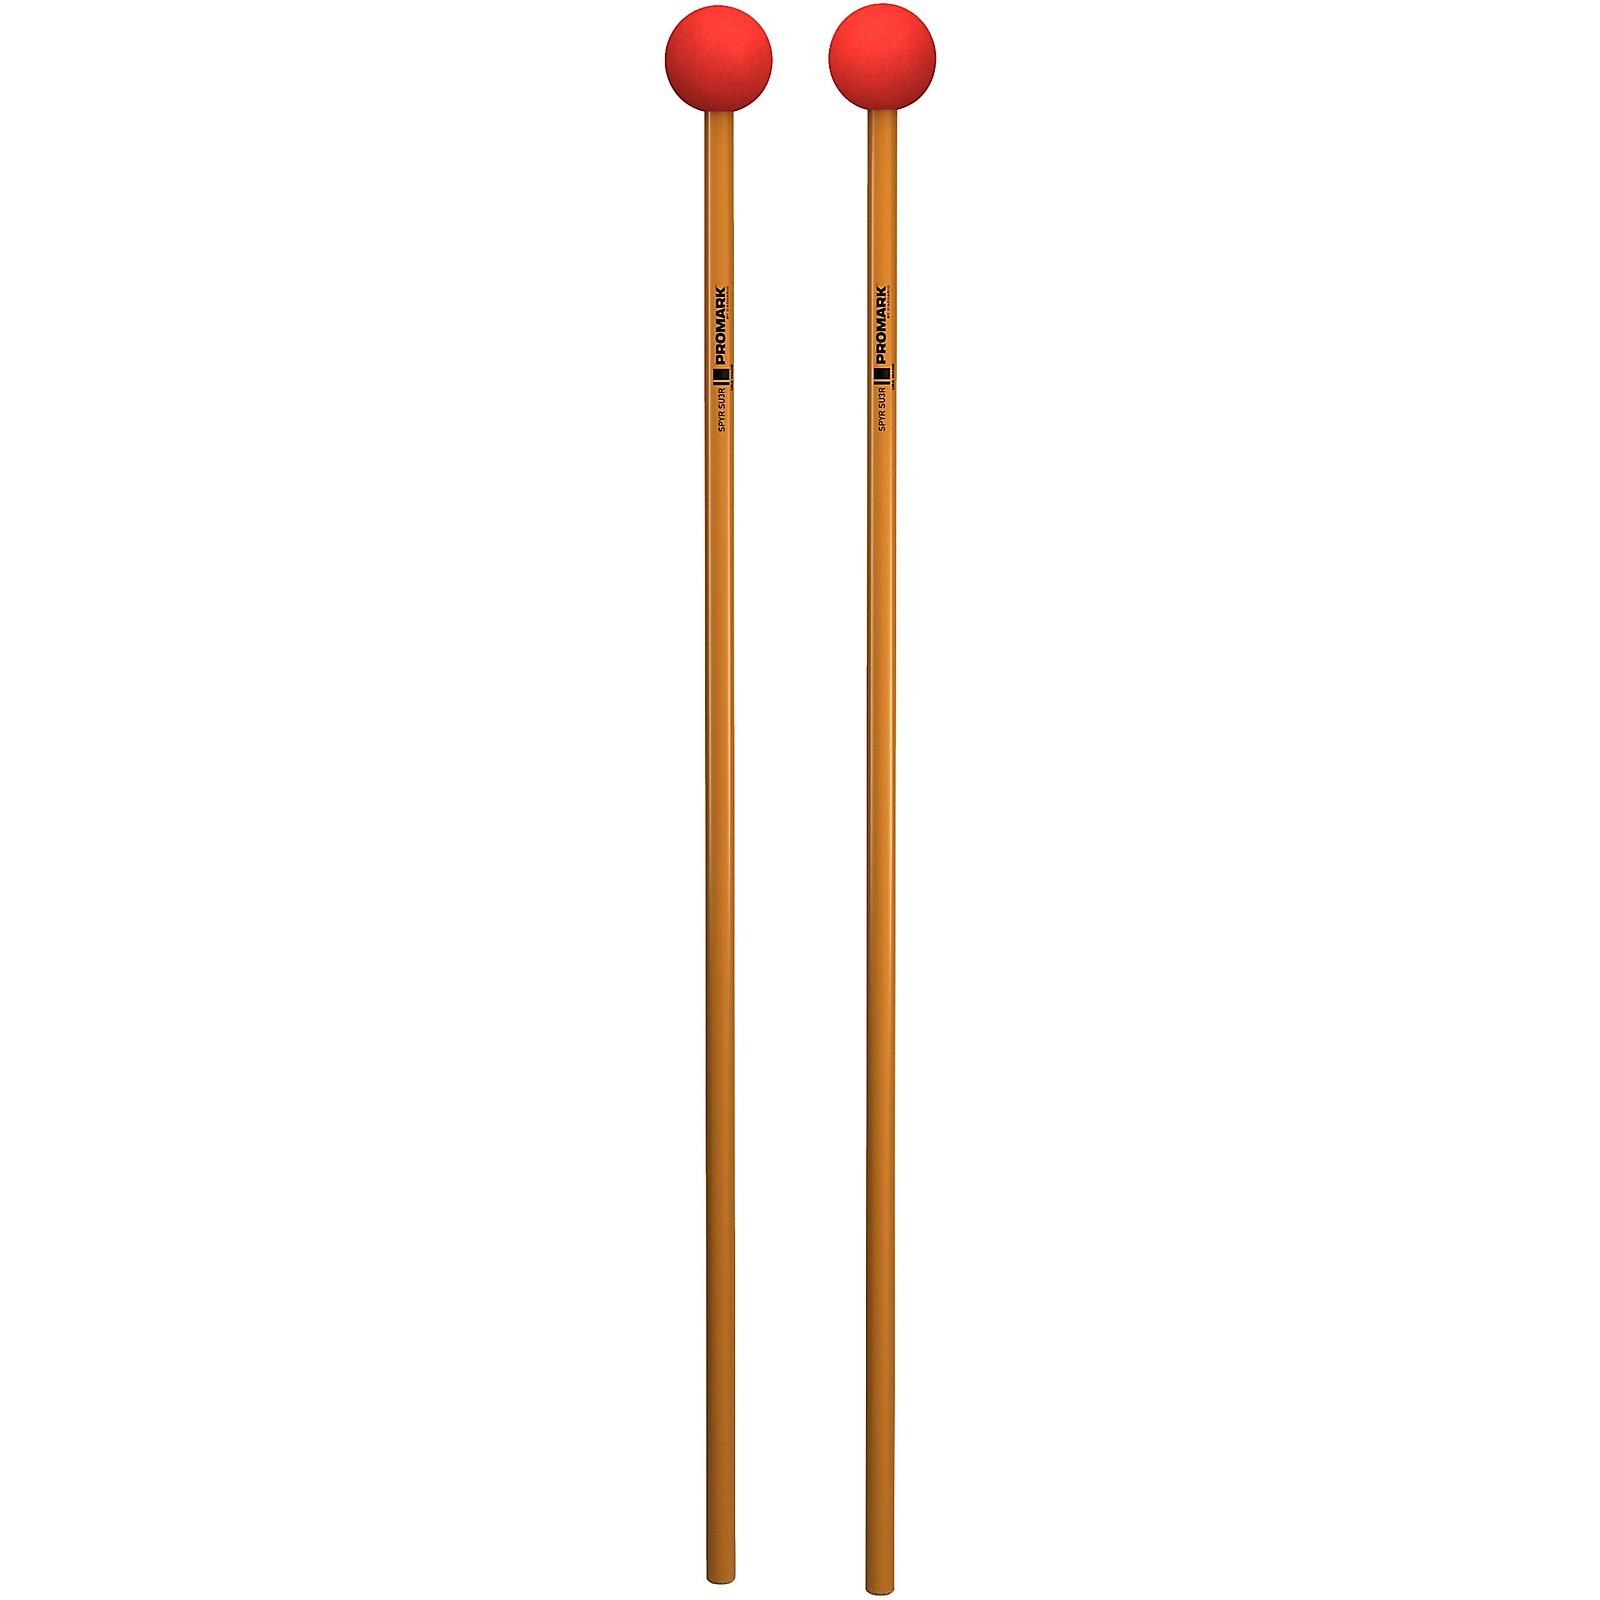 Promark SPYR Xylophone/Bell Mallets